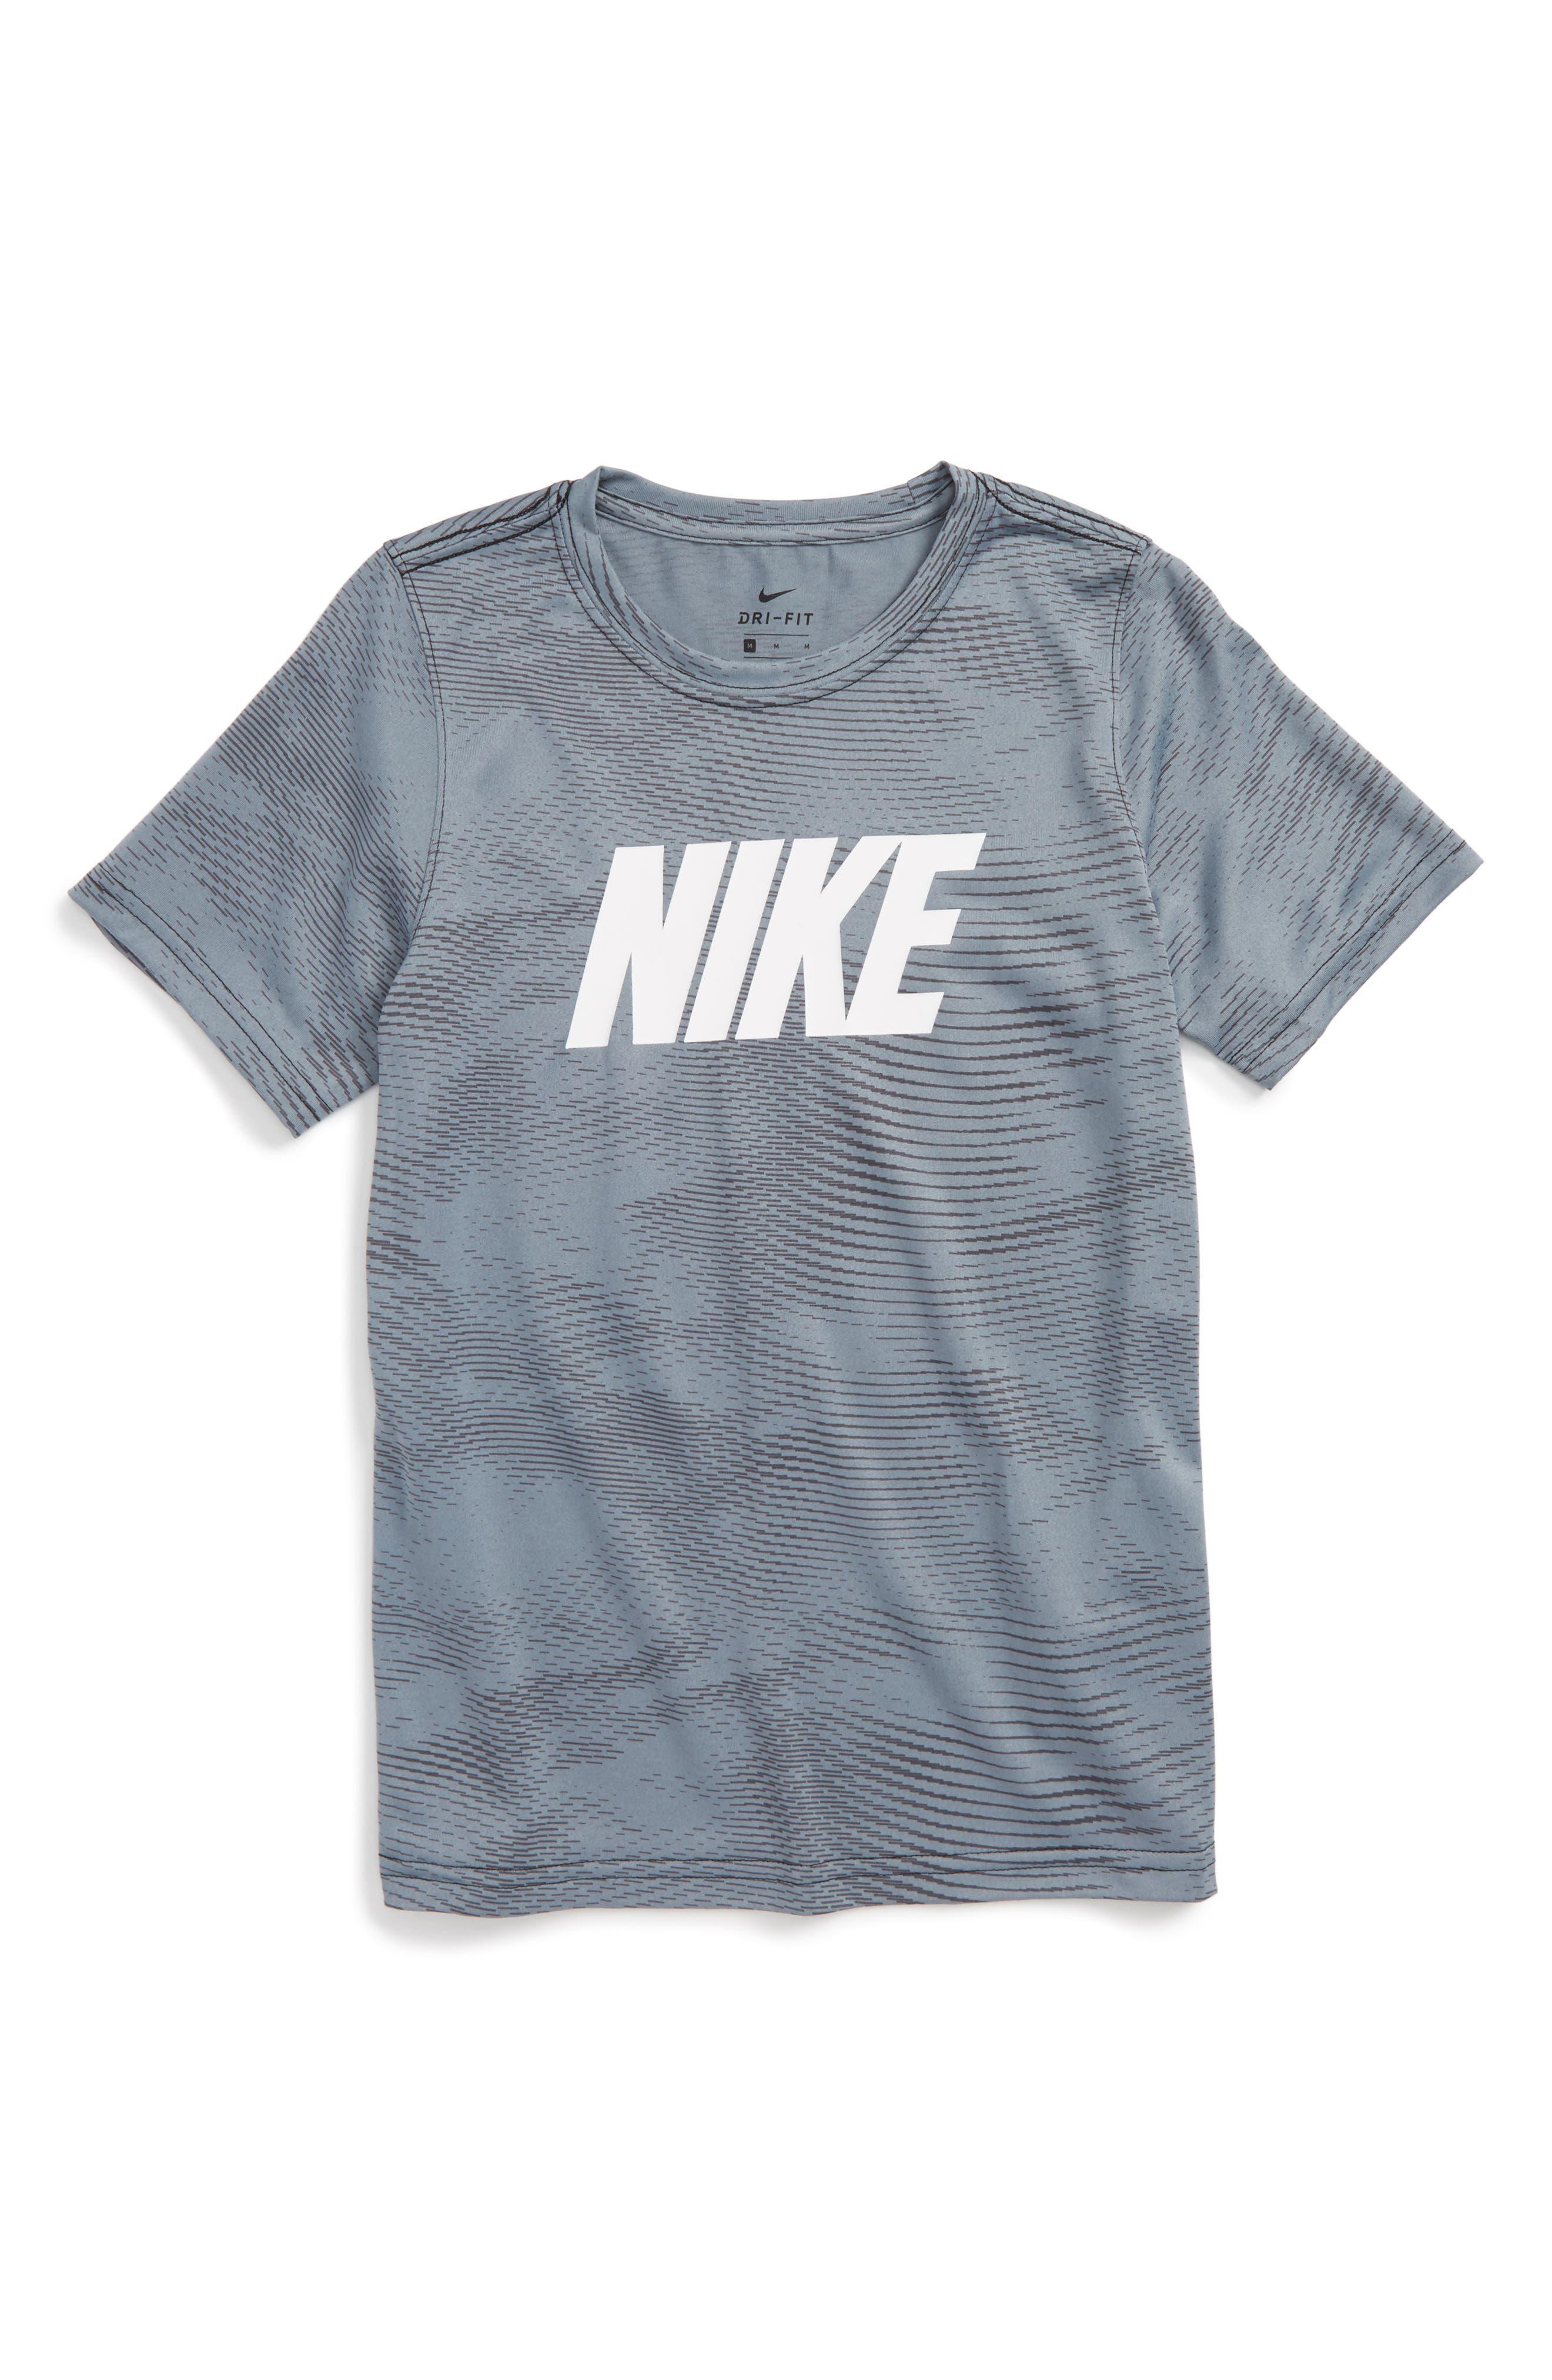 Nike Dry Graphic T-Shirt (Little Boys & Big Boys) (Regular Retail Price: $25.00)